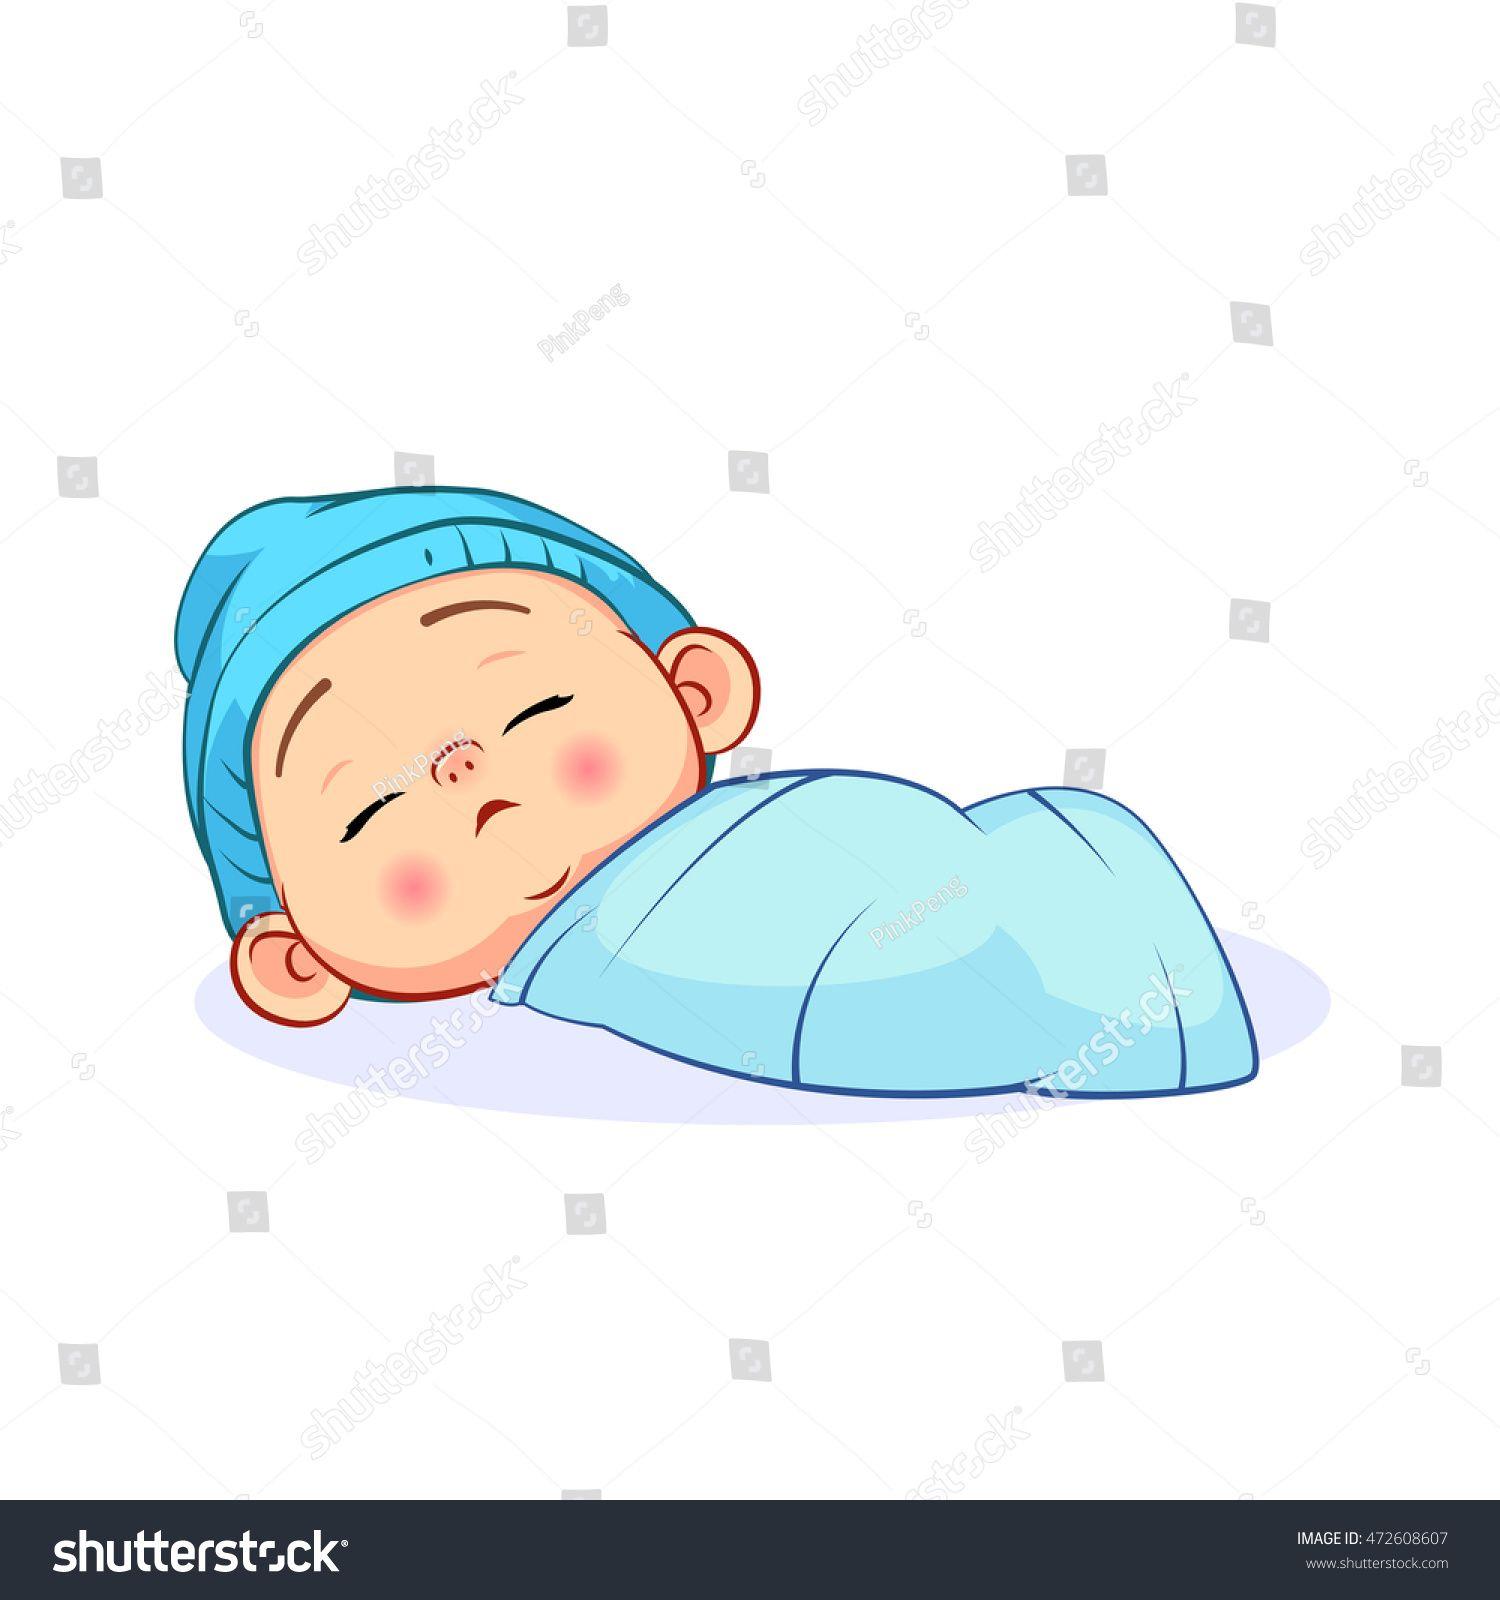 Newborn Sleeping On Light Background Real Life Lifestyle Stock Caricatura De Bebe Diseno De Personajes Ilustraciones